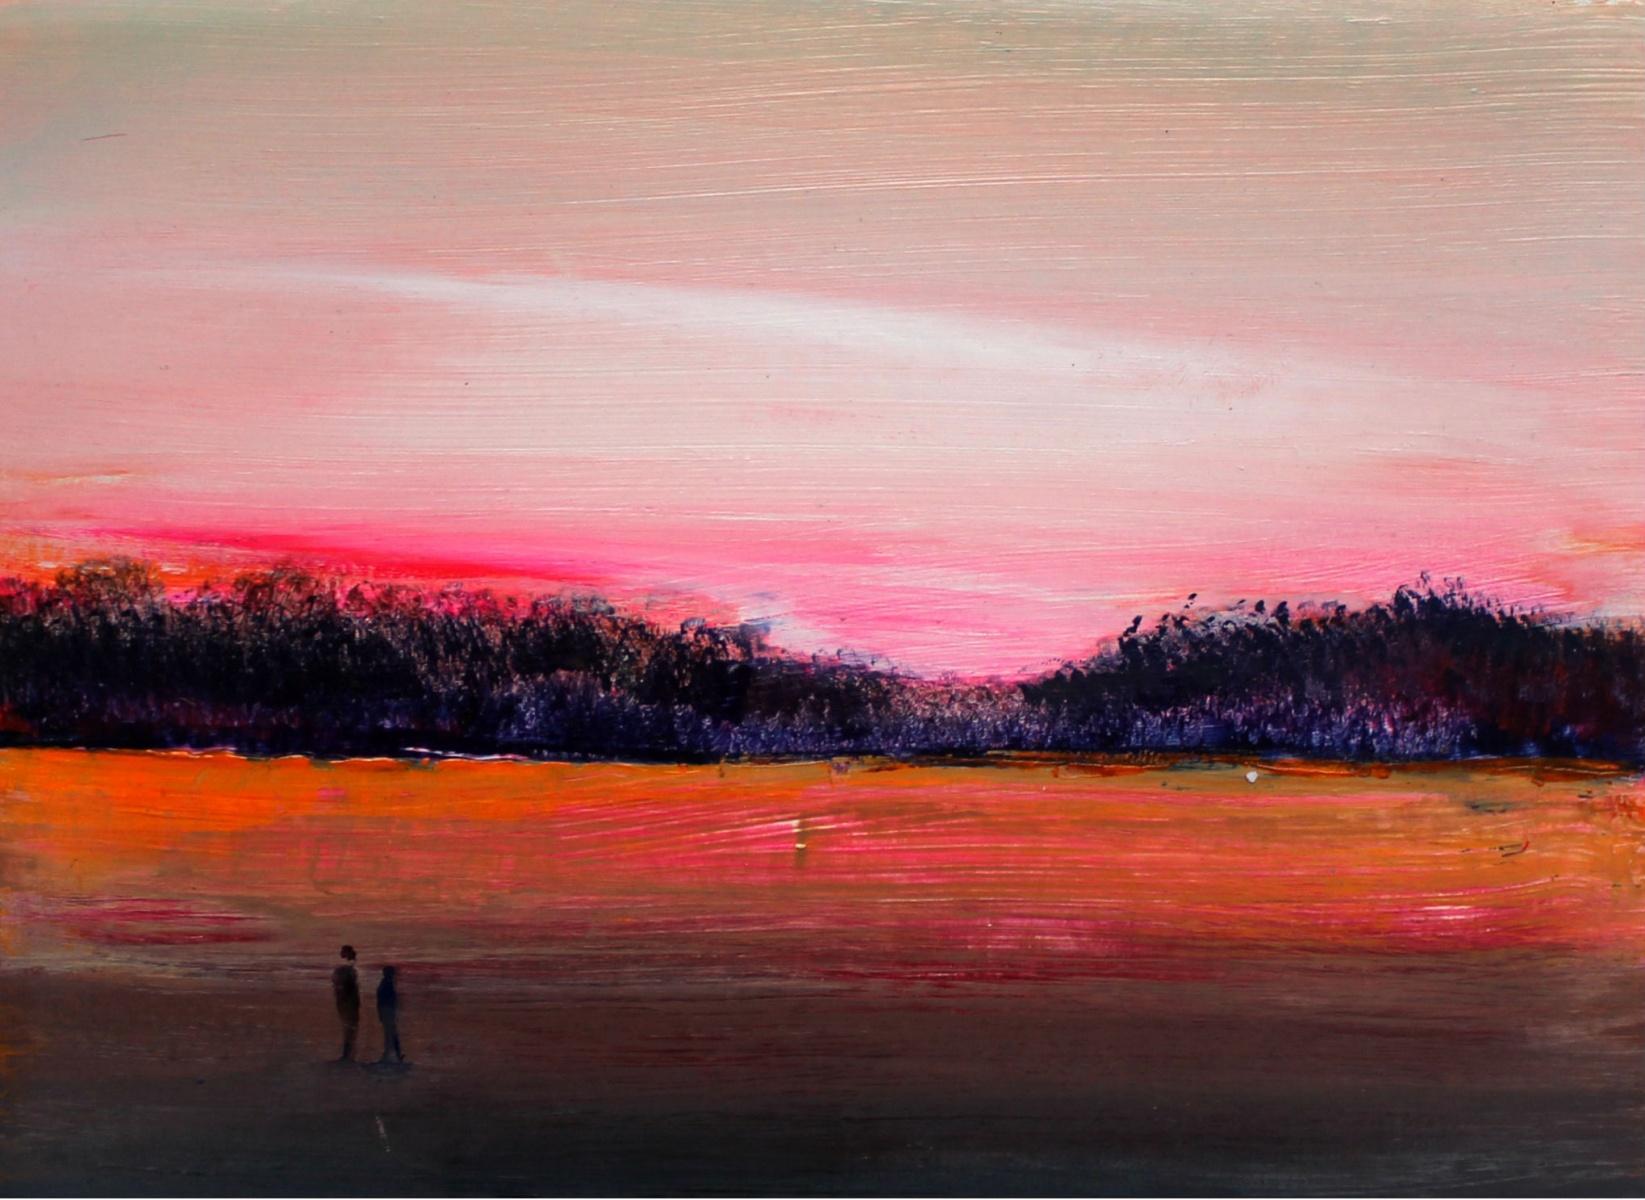 Landscape III - Acrylic Figurative Painting, Vibrant colors, Pink & orange